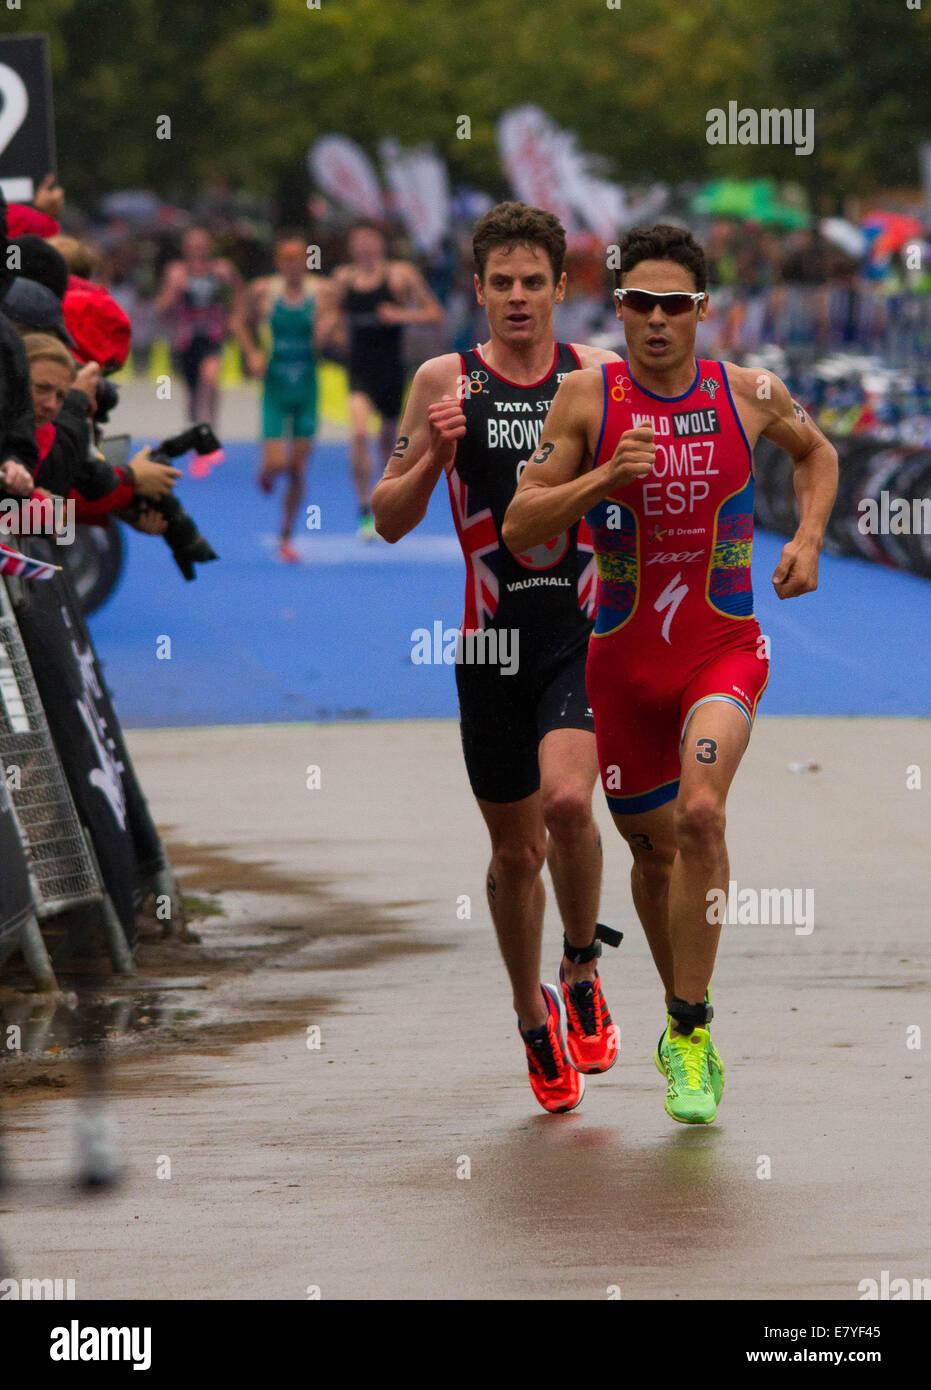 Jonny Brownlee and Javier Gomez during the 2013 Triathlon held in London - Stock Image